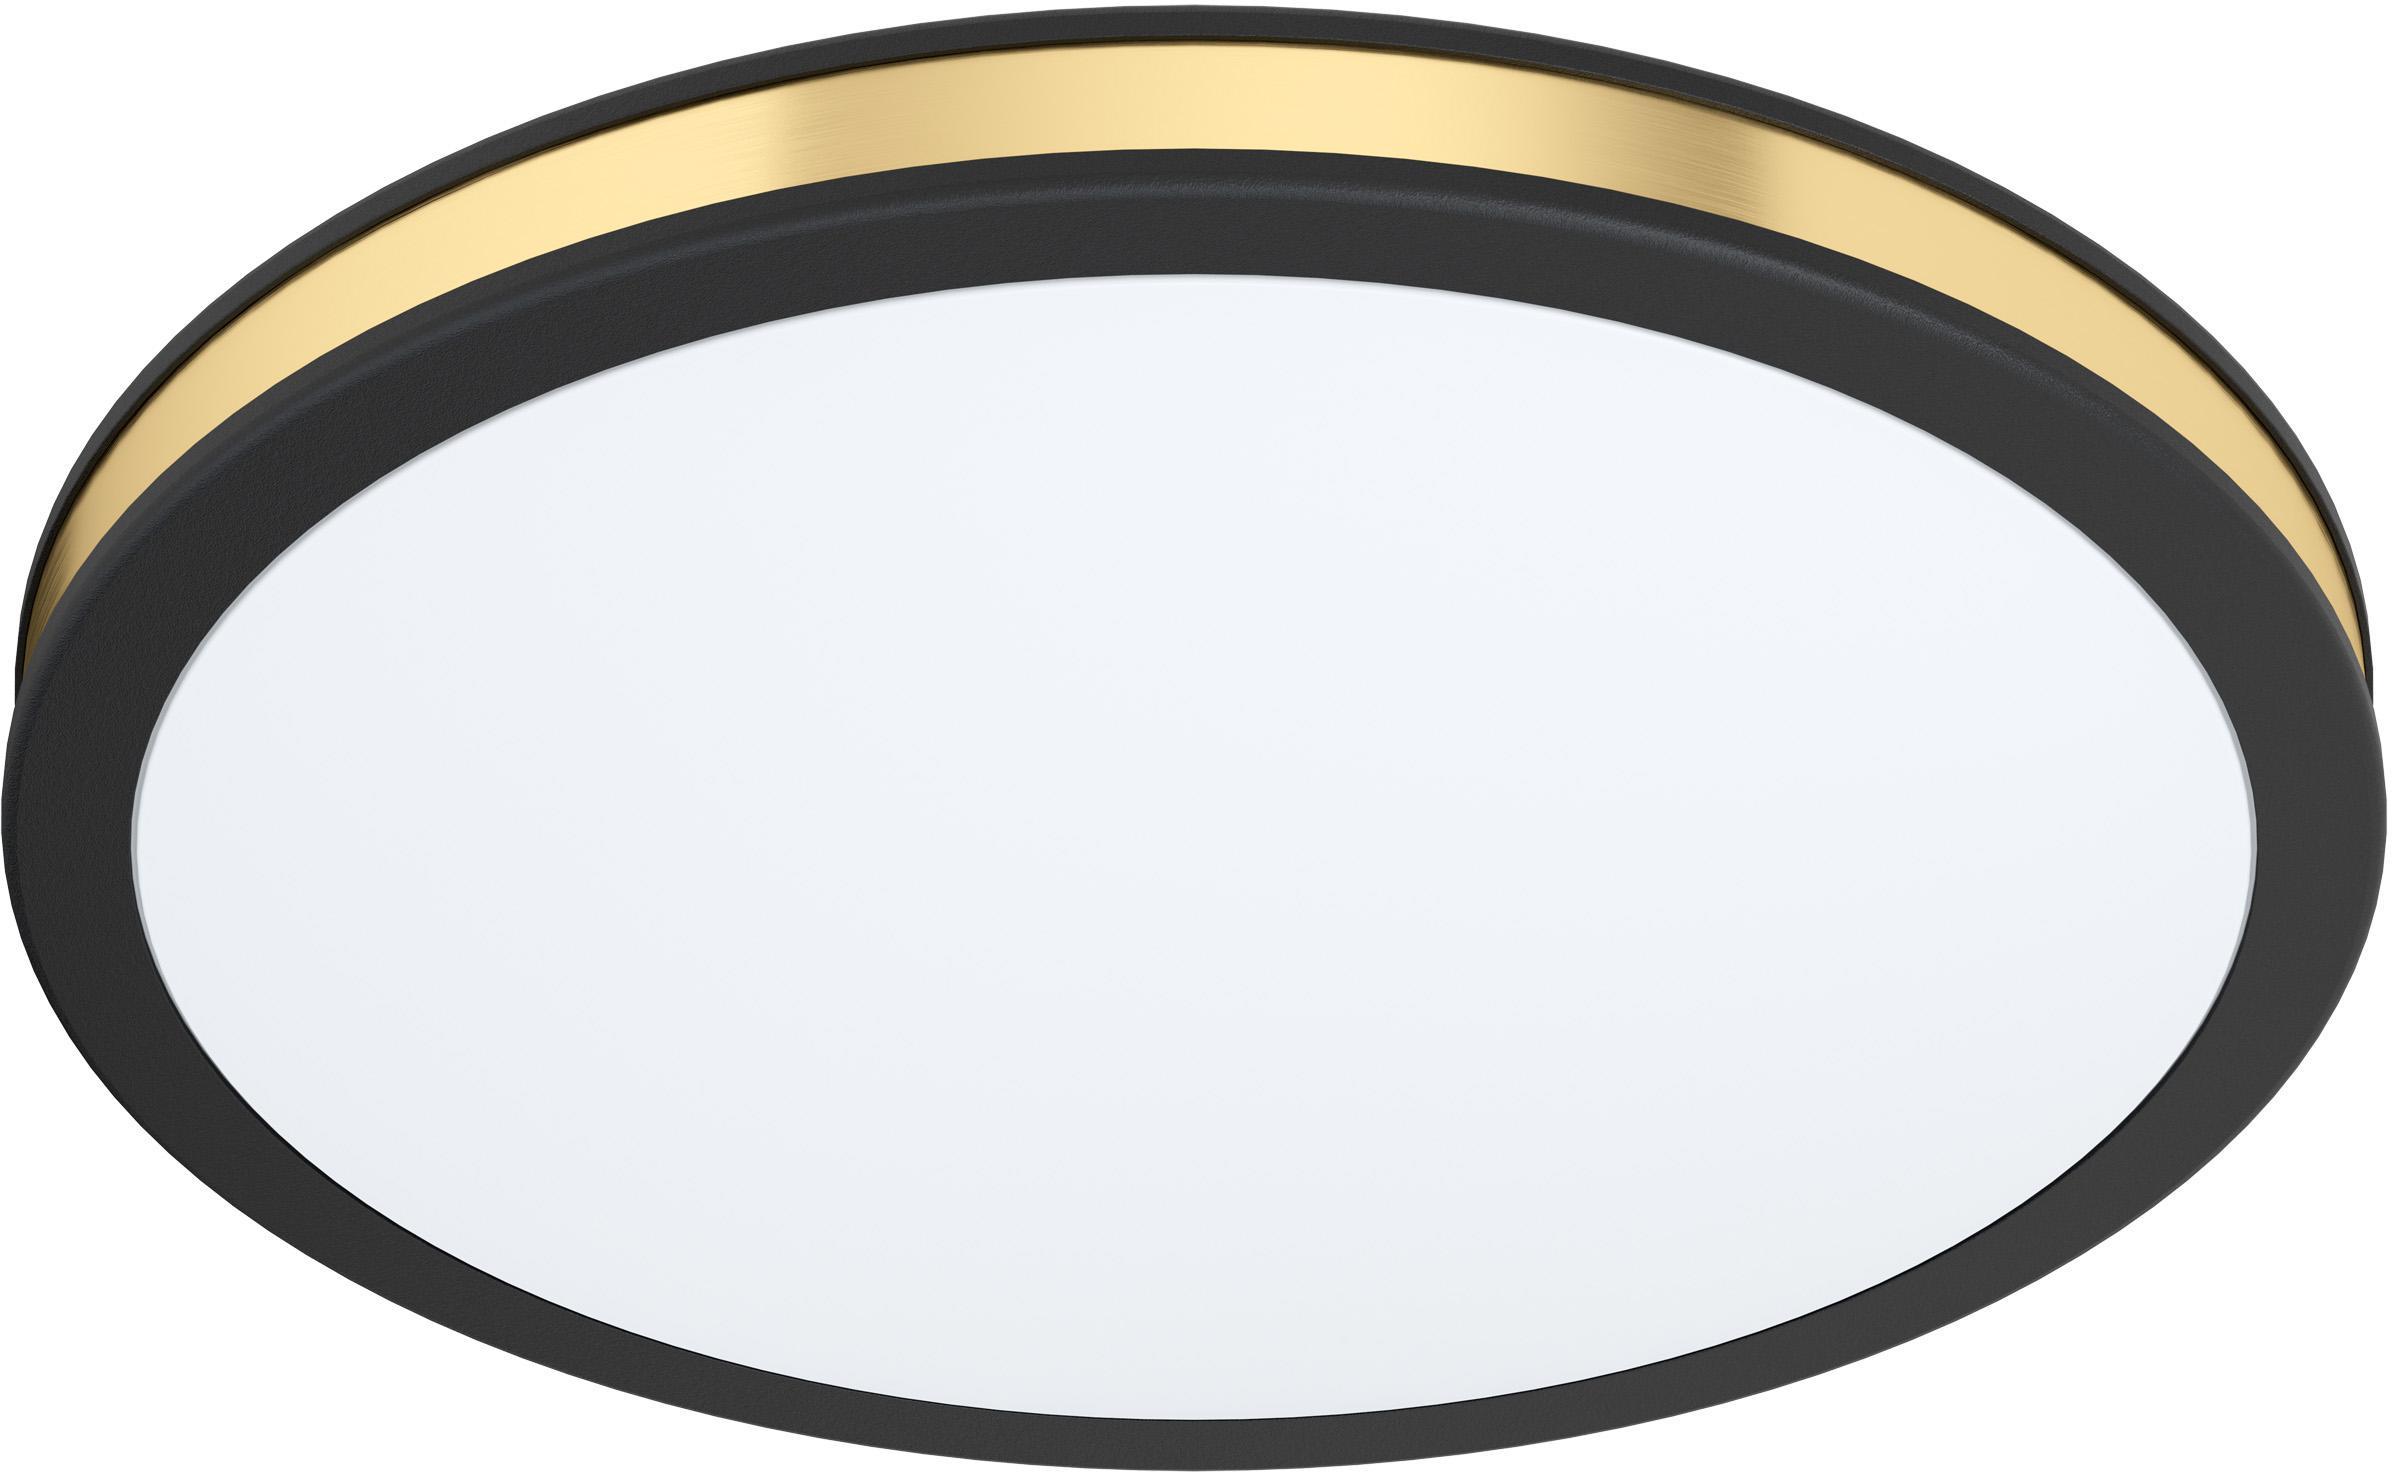 LED plafondlamp Pescaito, Lampenkap: kunststof, Baldakijn: gelakt metaal, Zwart, goudkleurig, Ø 28 x H 5 cm